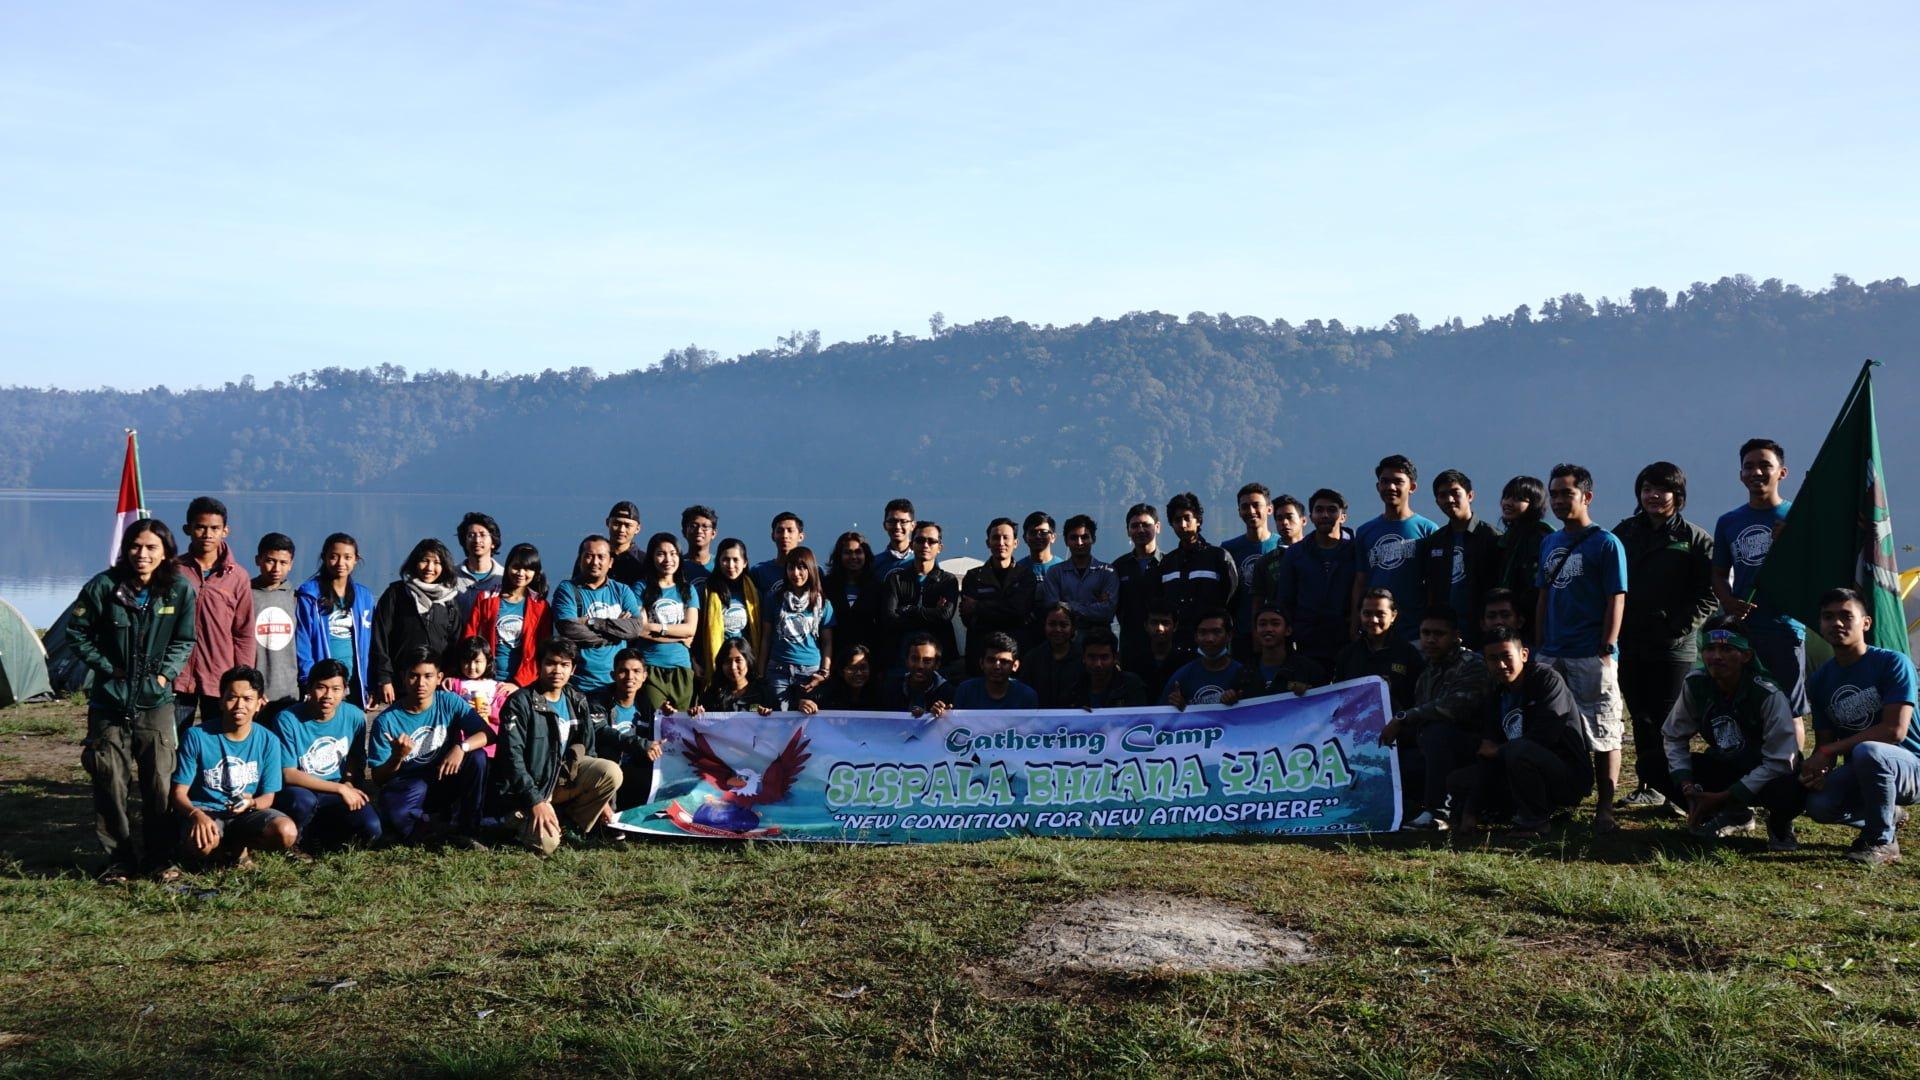 Gathering Camp Sispala Bhuana Yasa Pertama tahun 2015 di Buyan